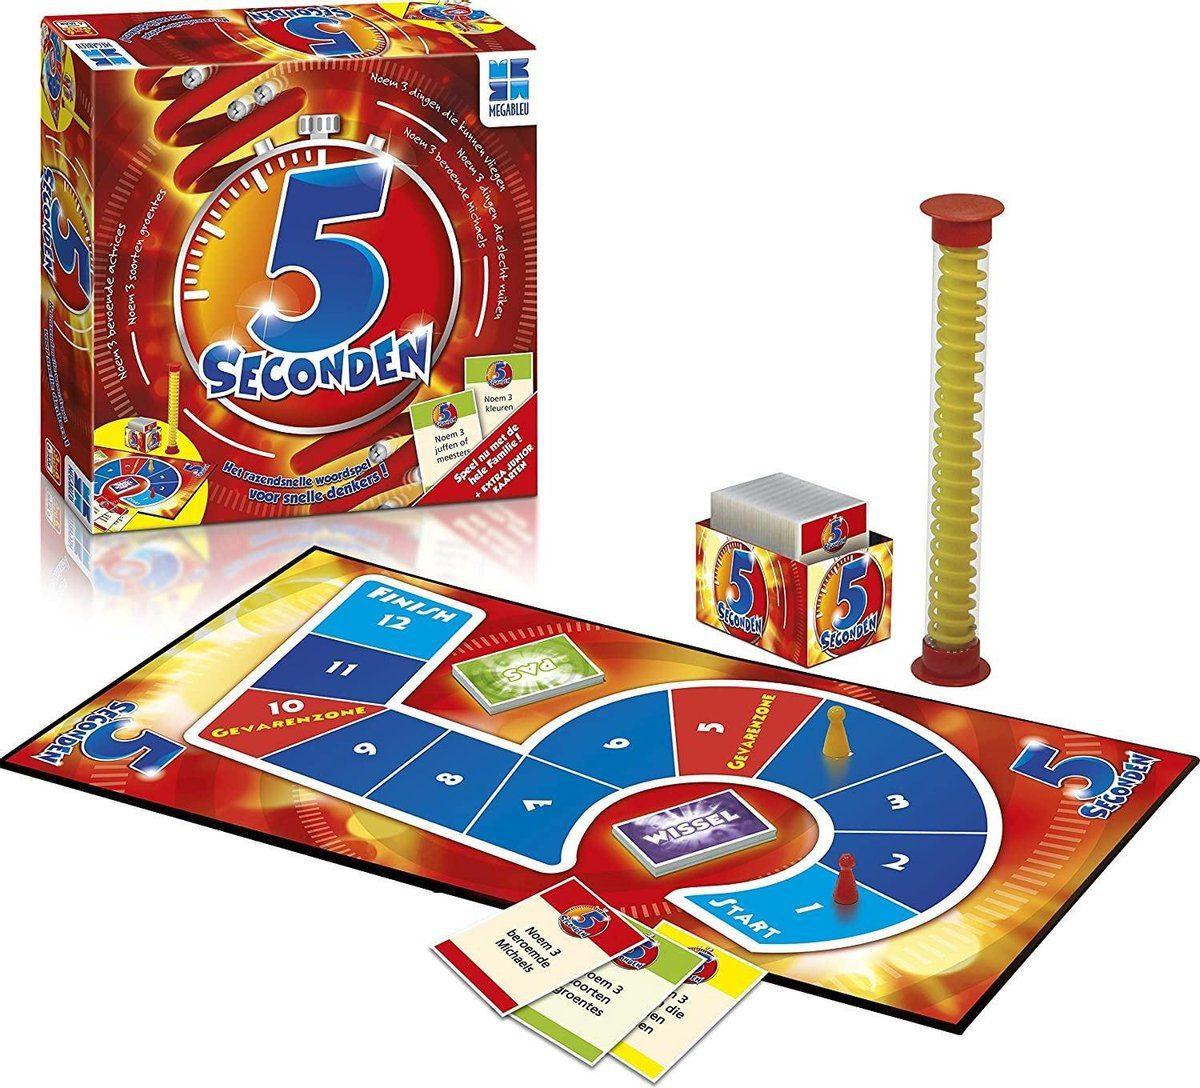 5 seconden partyspel